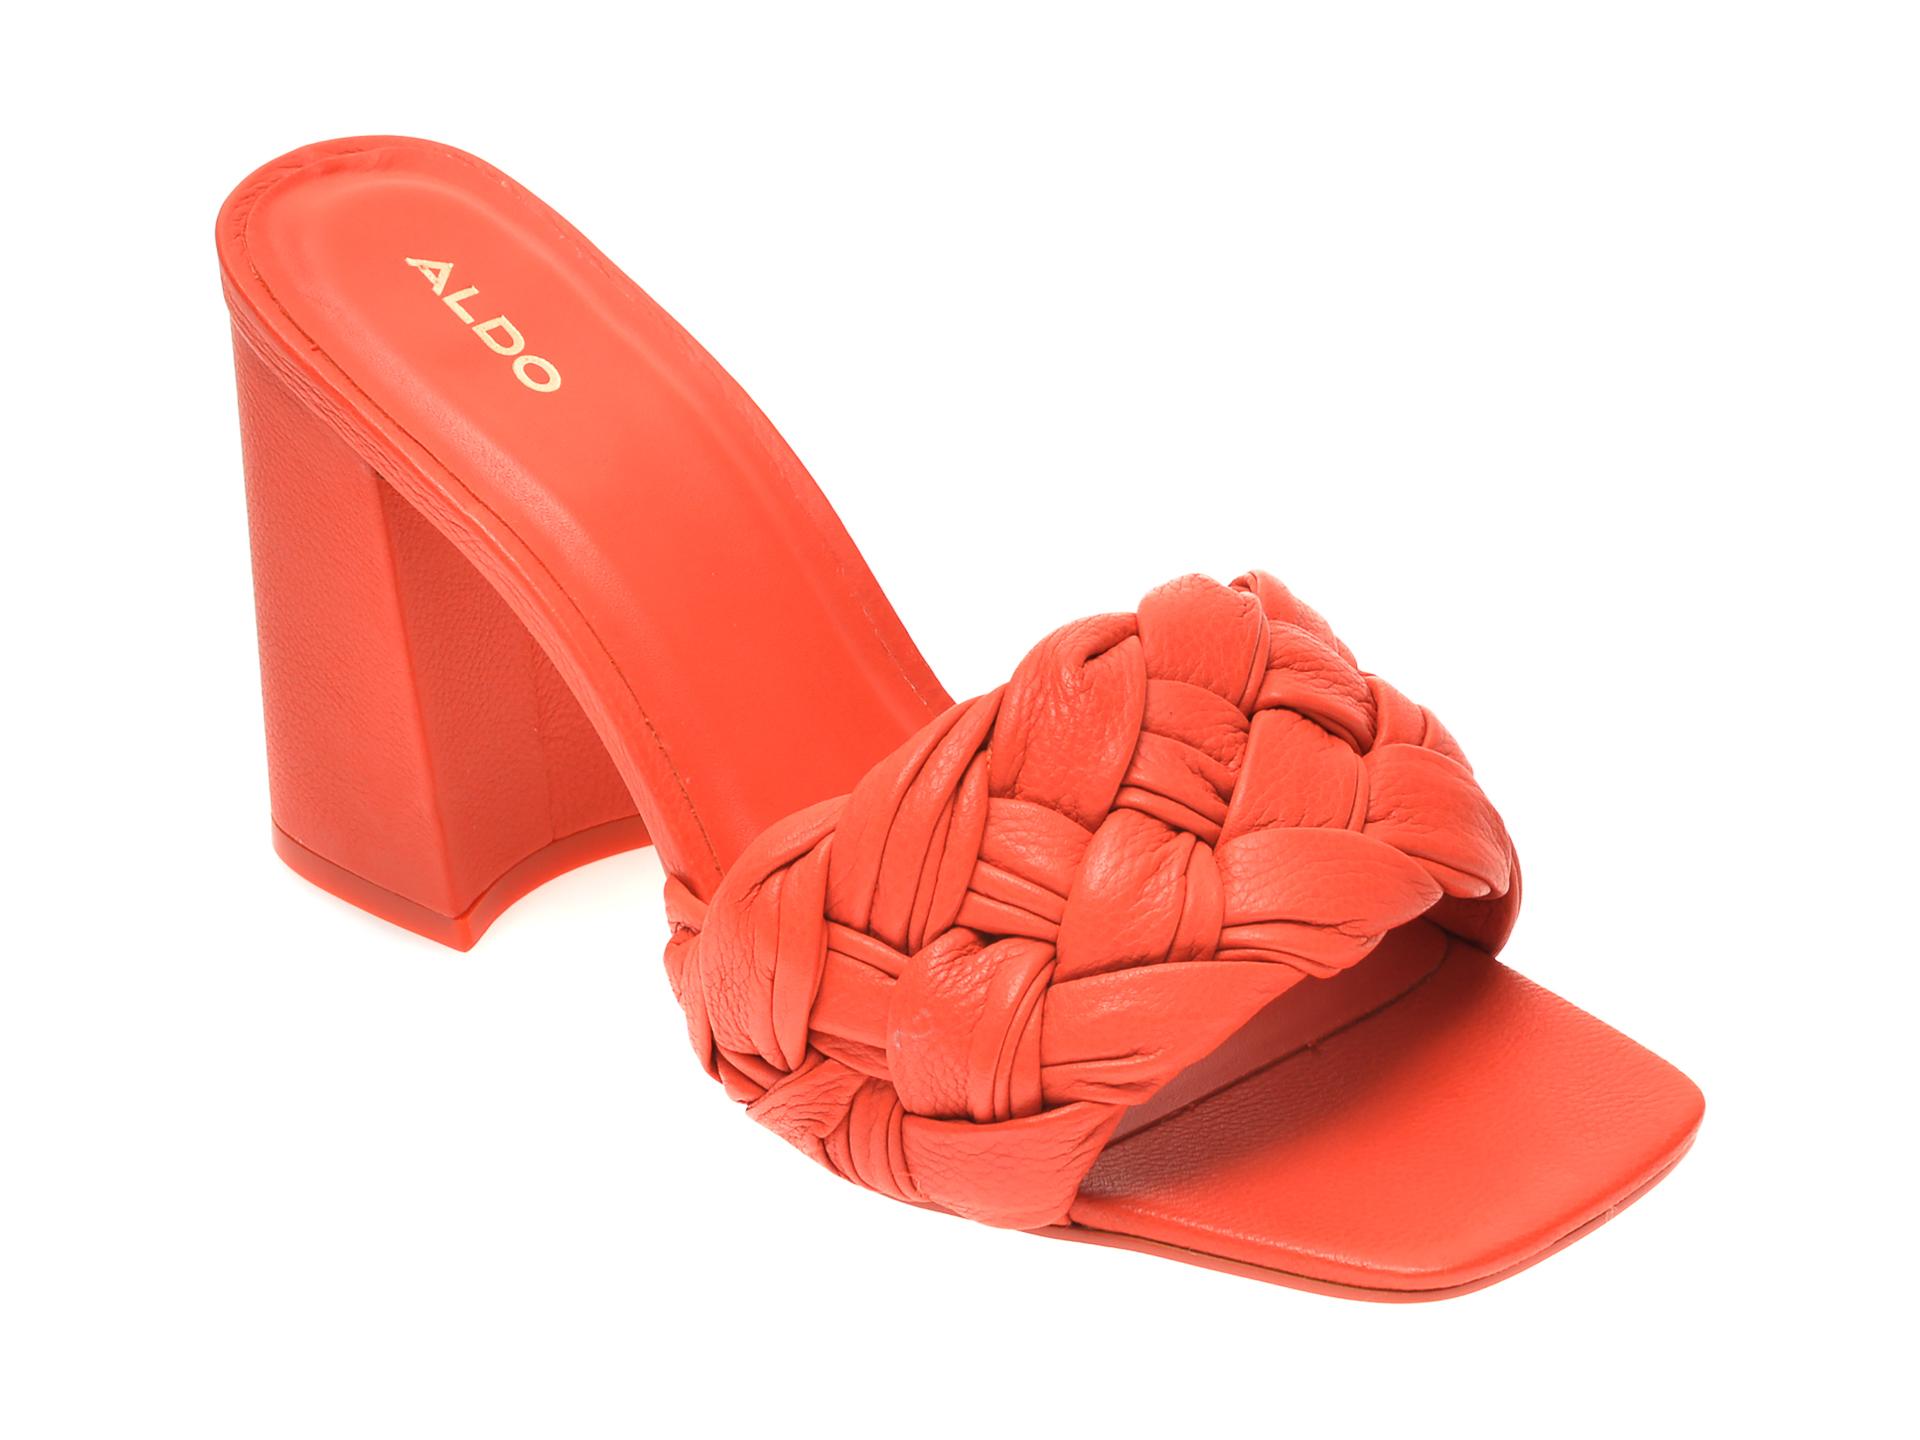 Papuci ALDO portocalii, Blakely820, din piele naturala